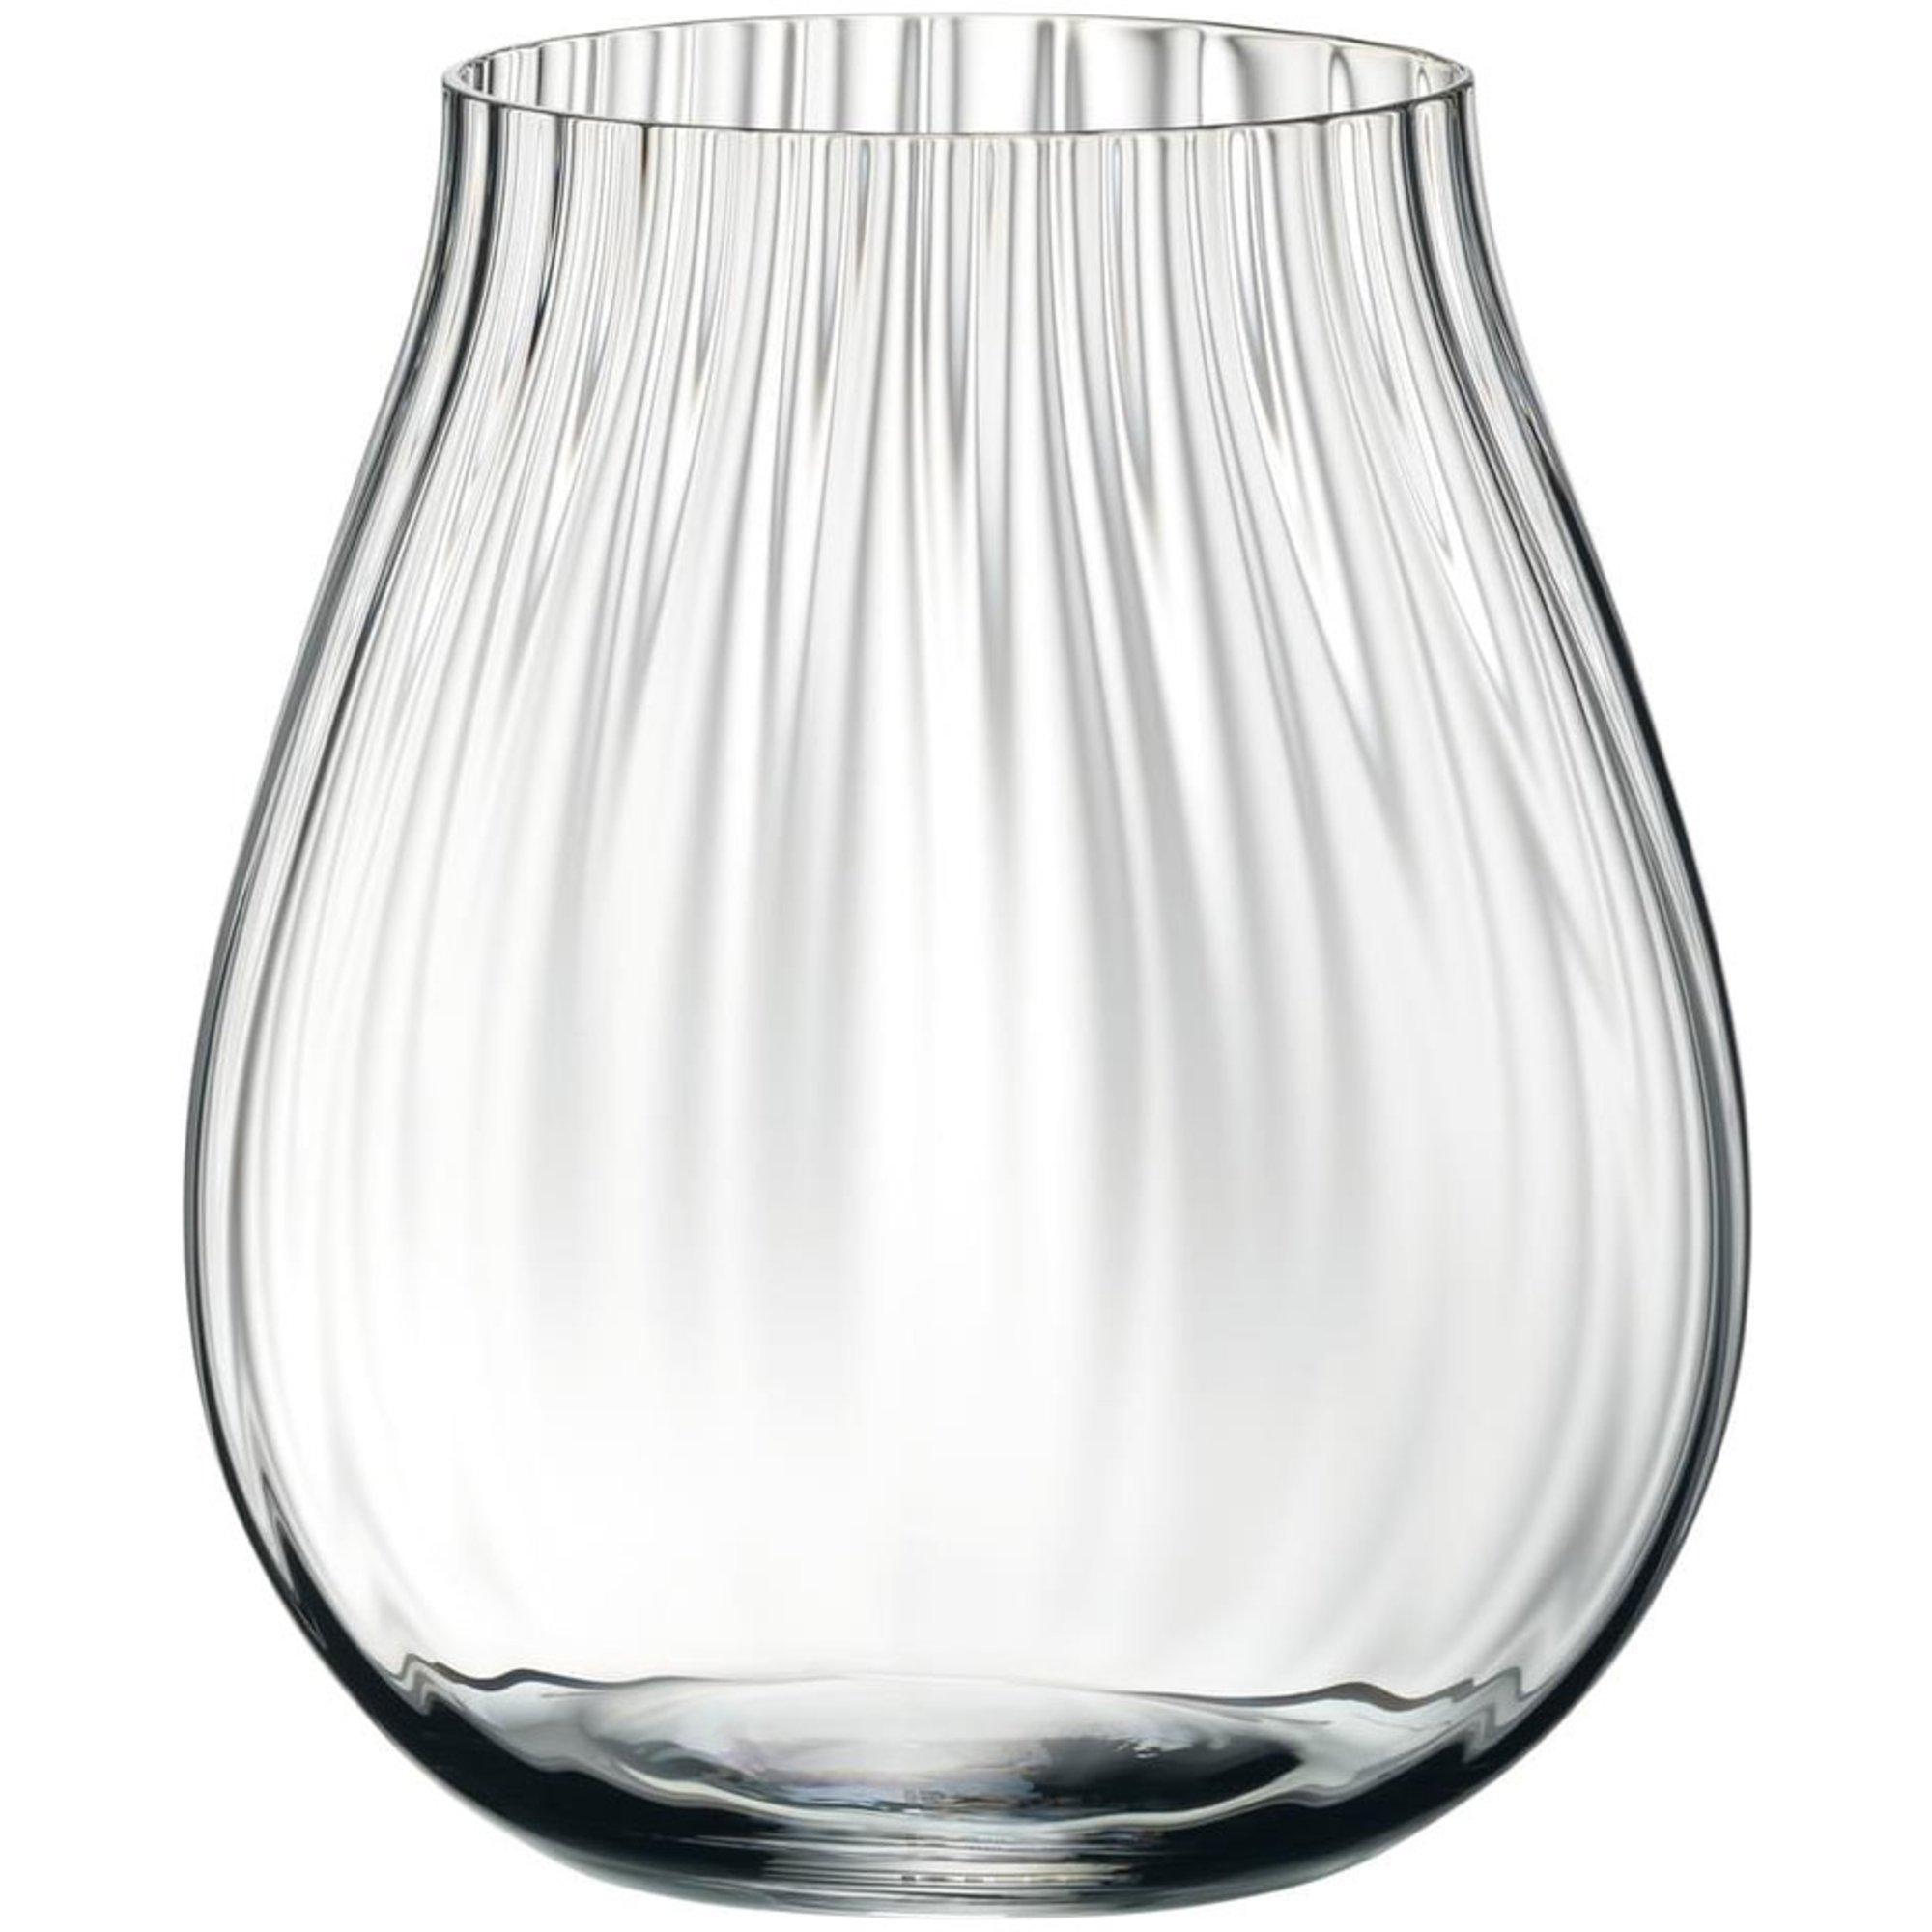 Riedel Optic Gin & Tonic-glas